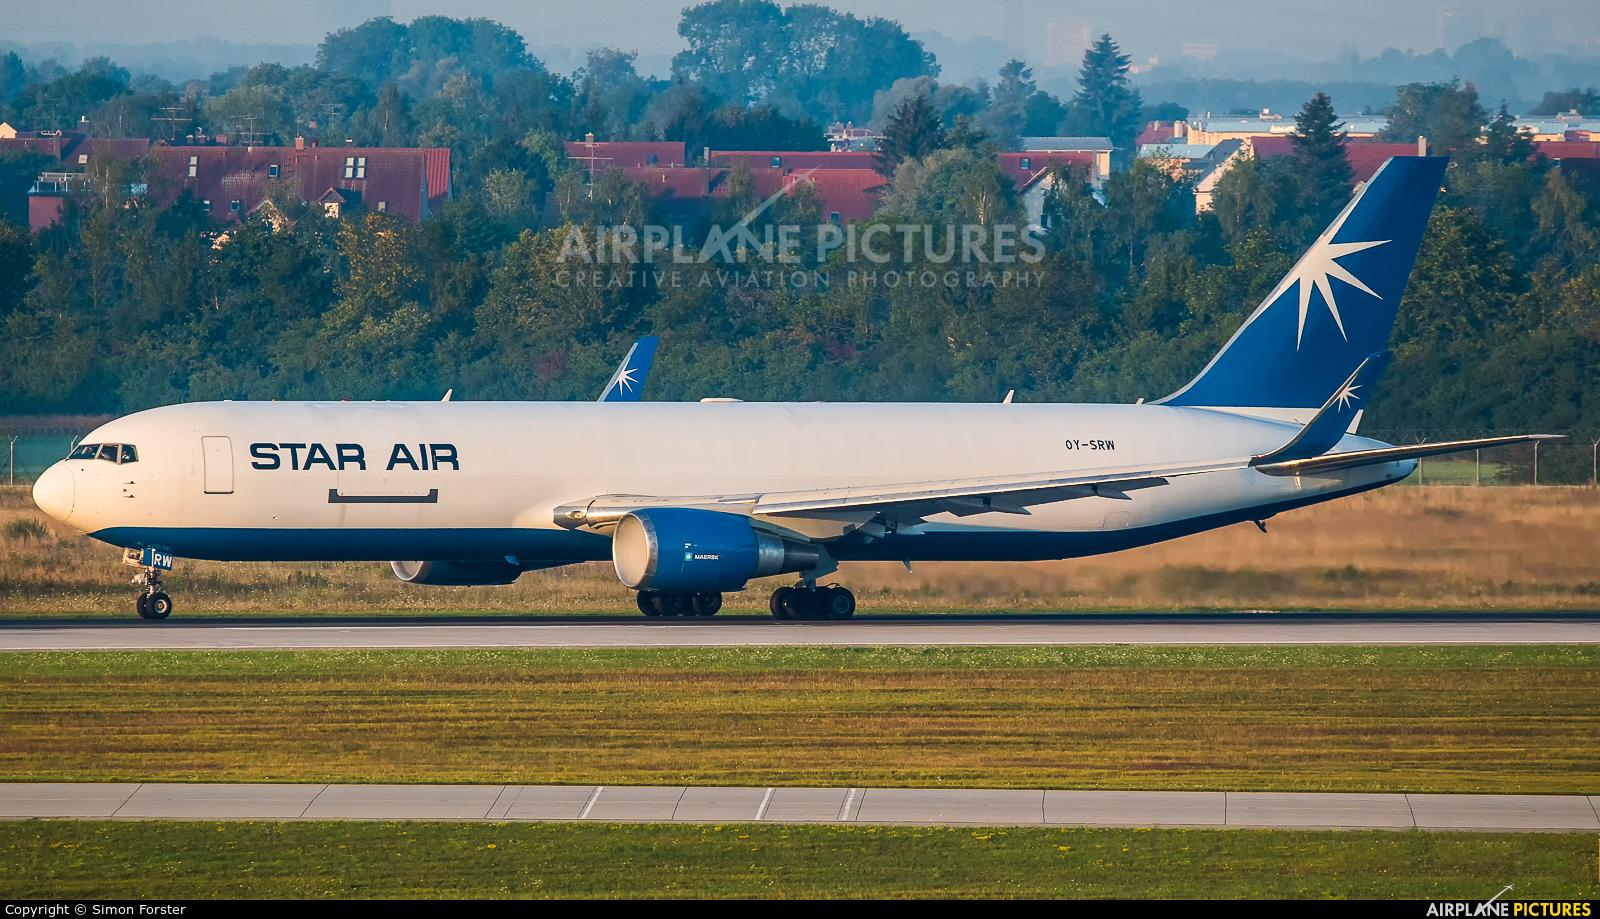 Star Air OY-SRW aircraft at Munich